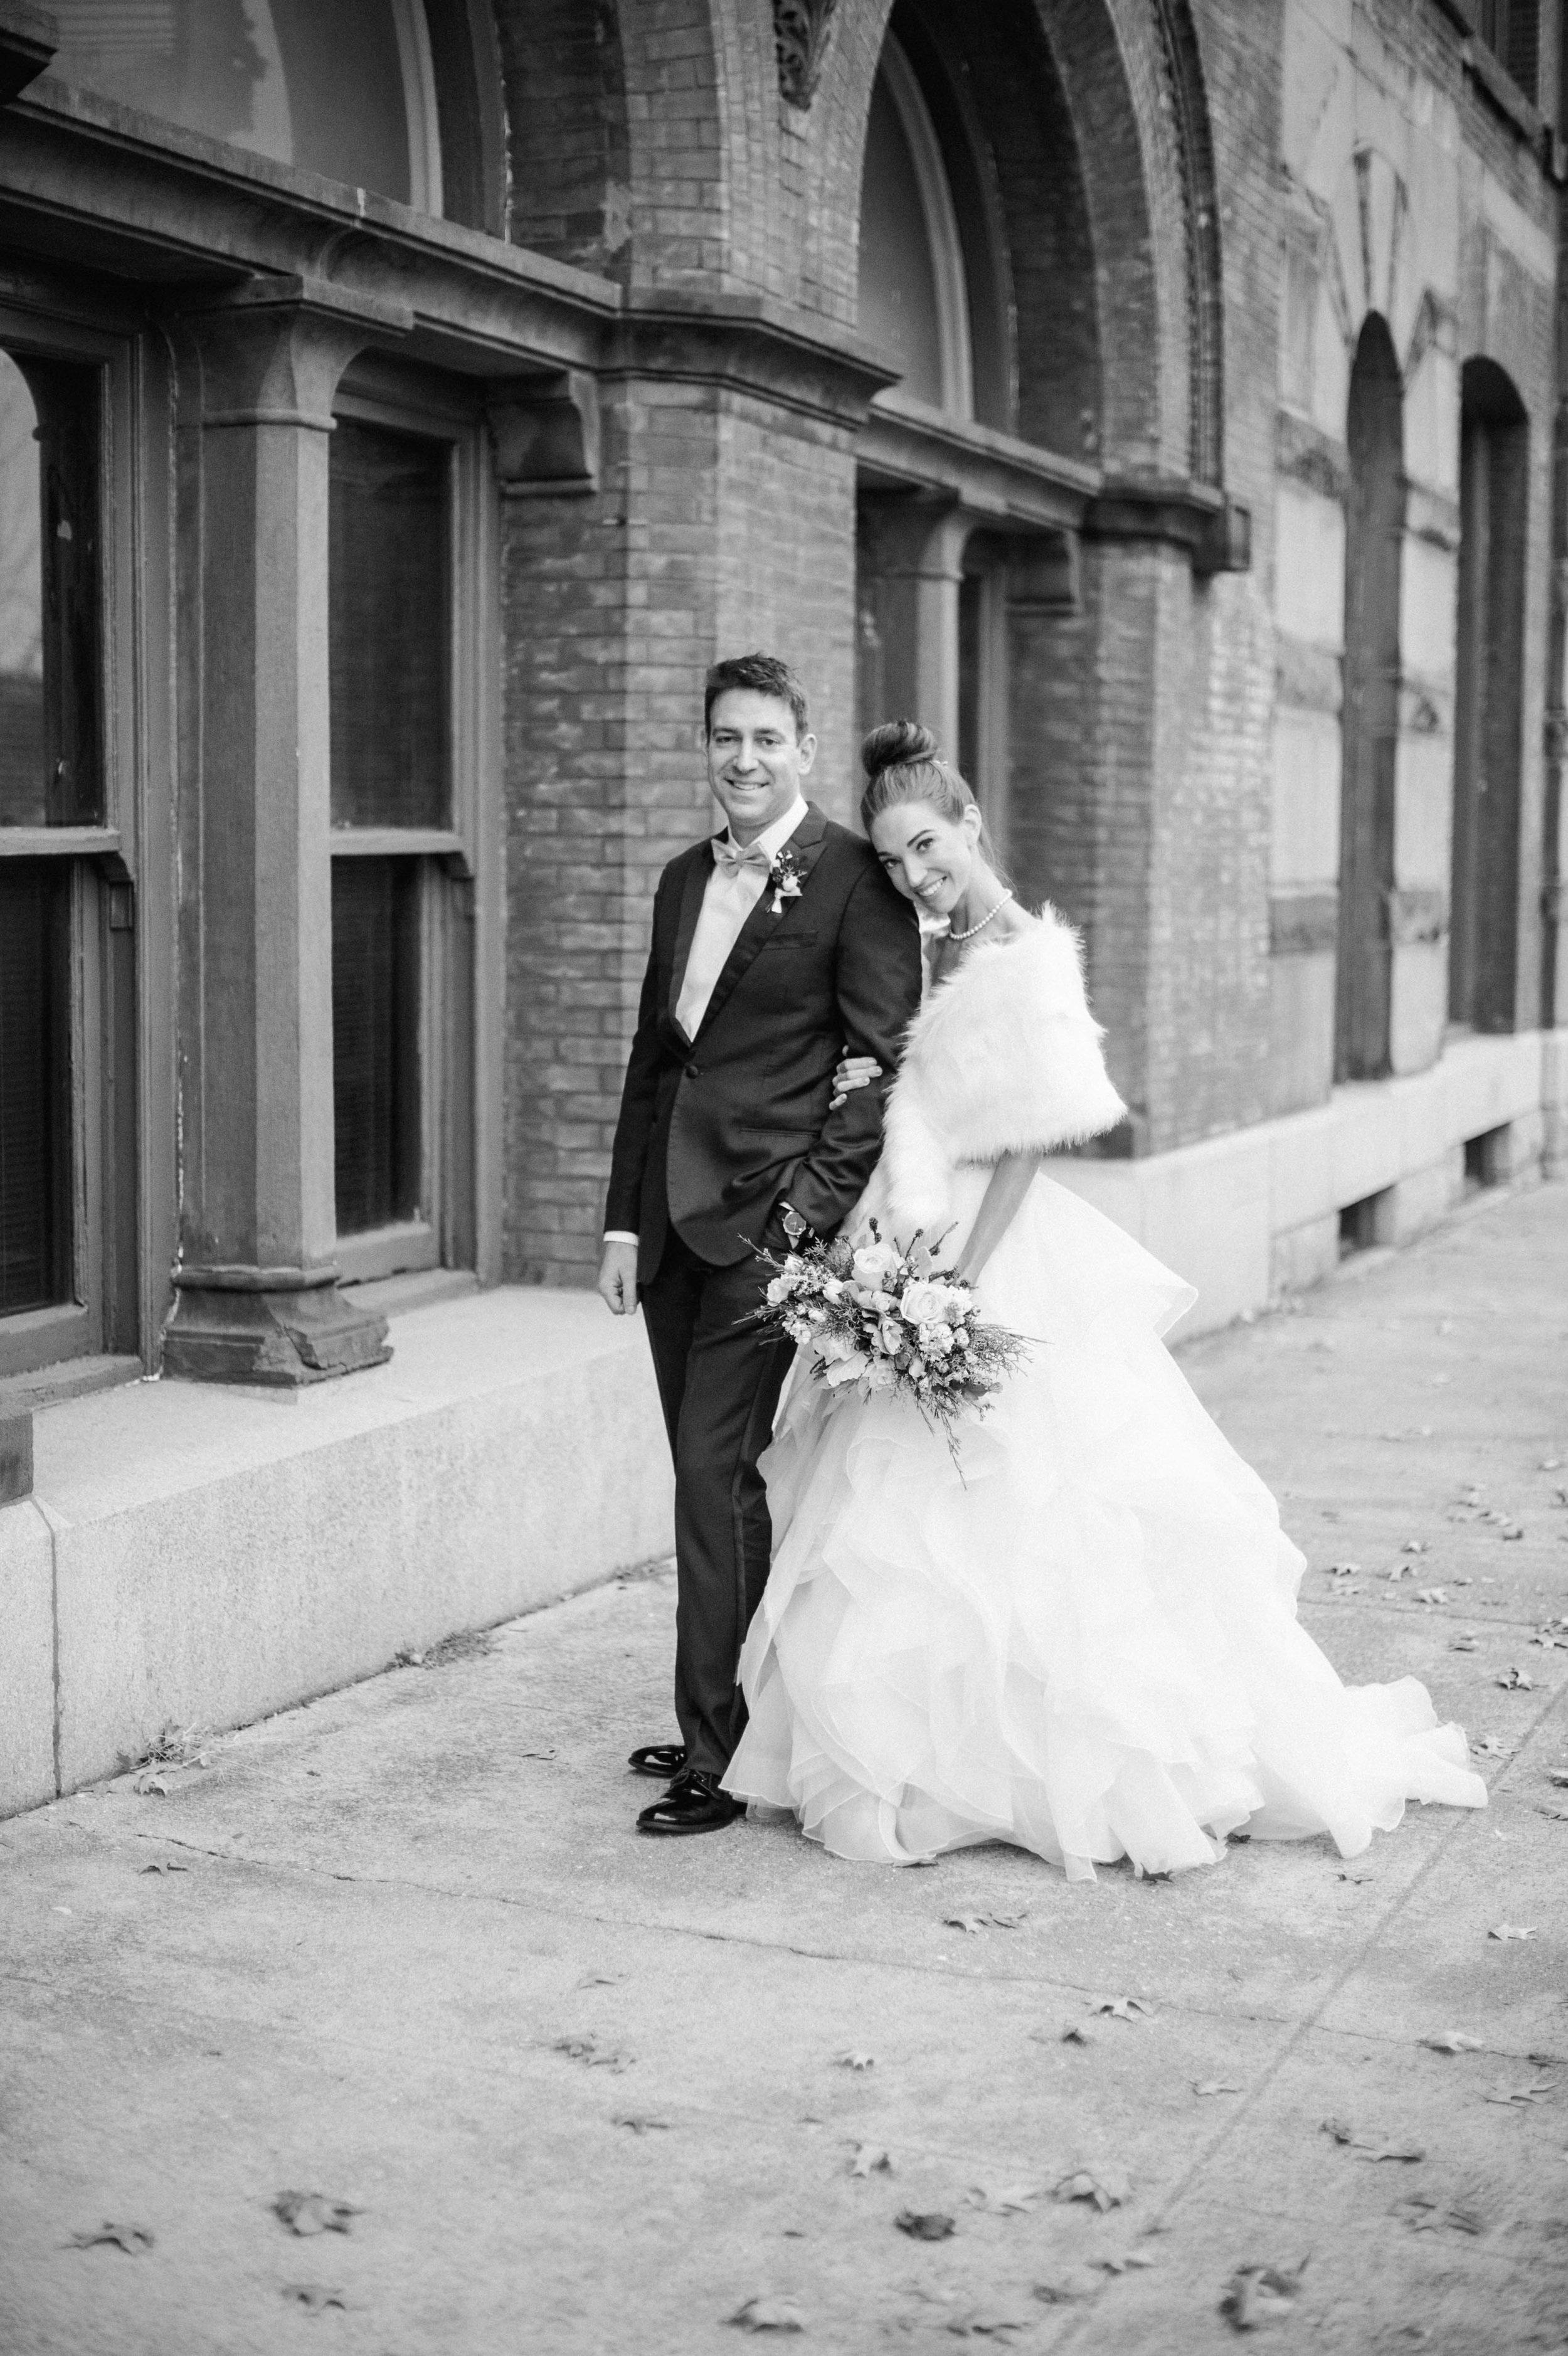 Miranda & Greg  -  St. Louis, MO